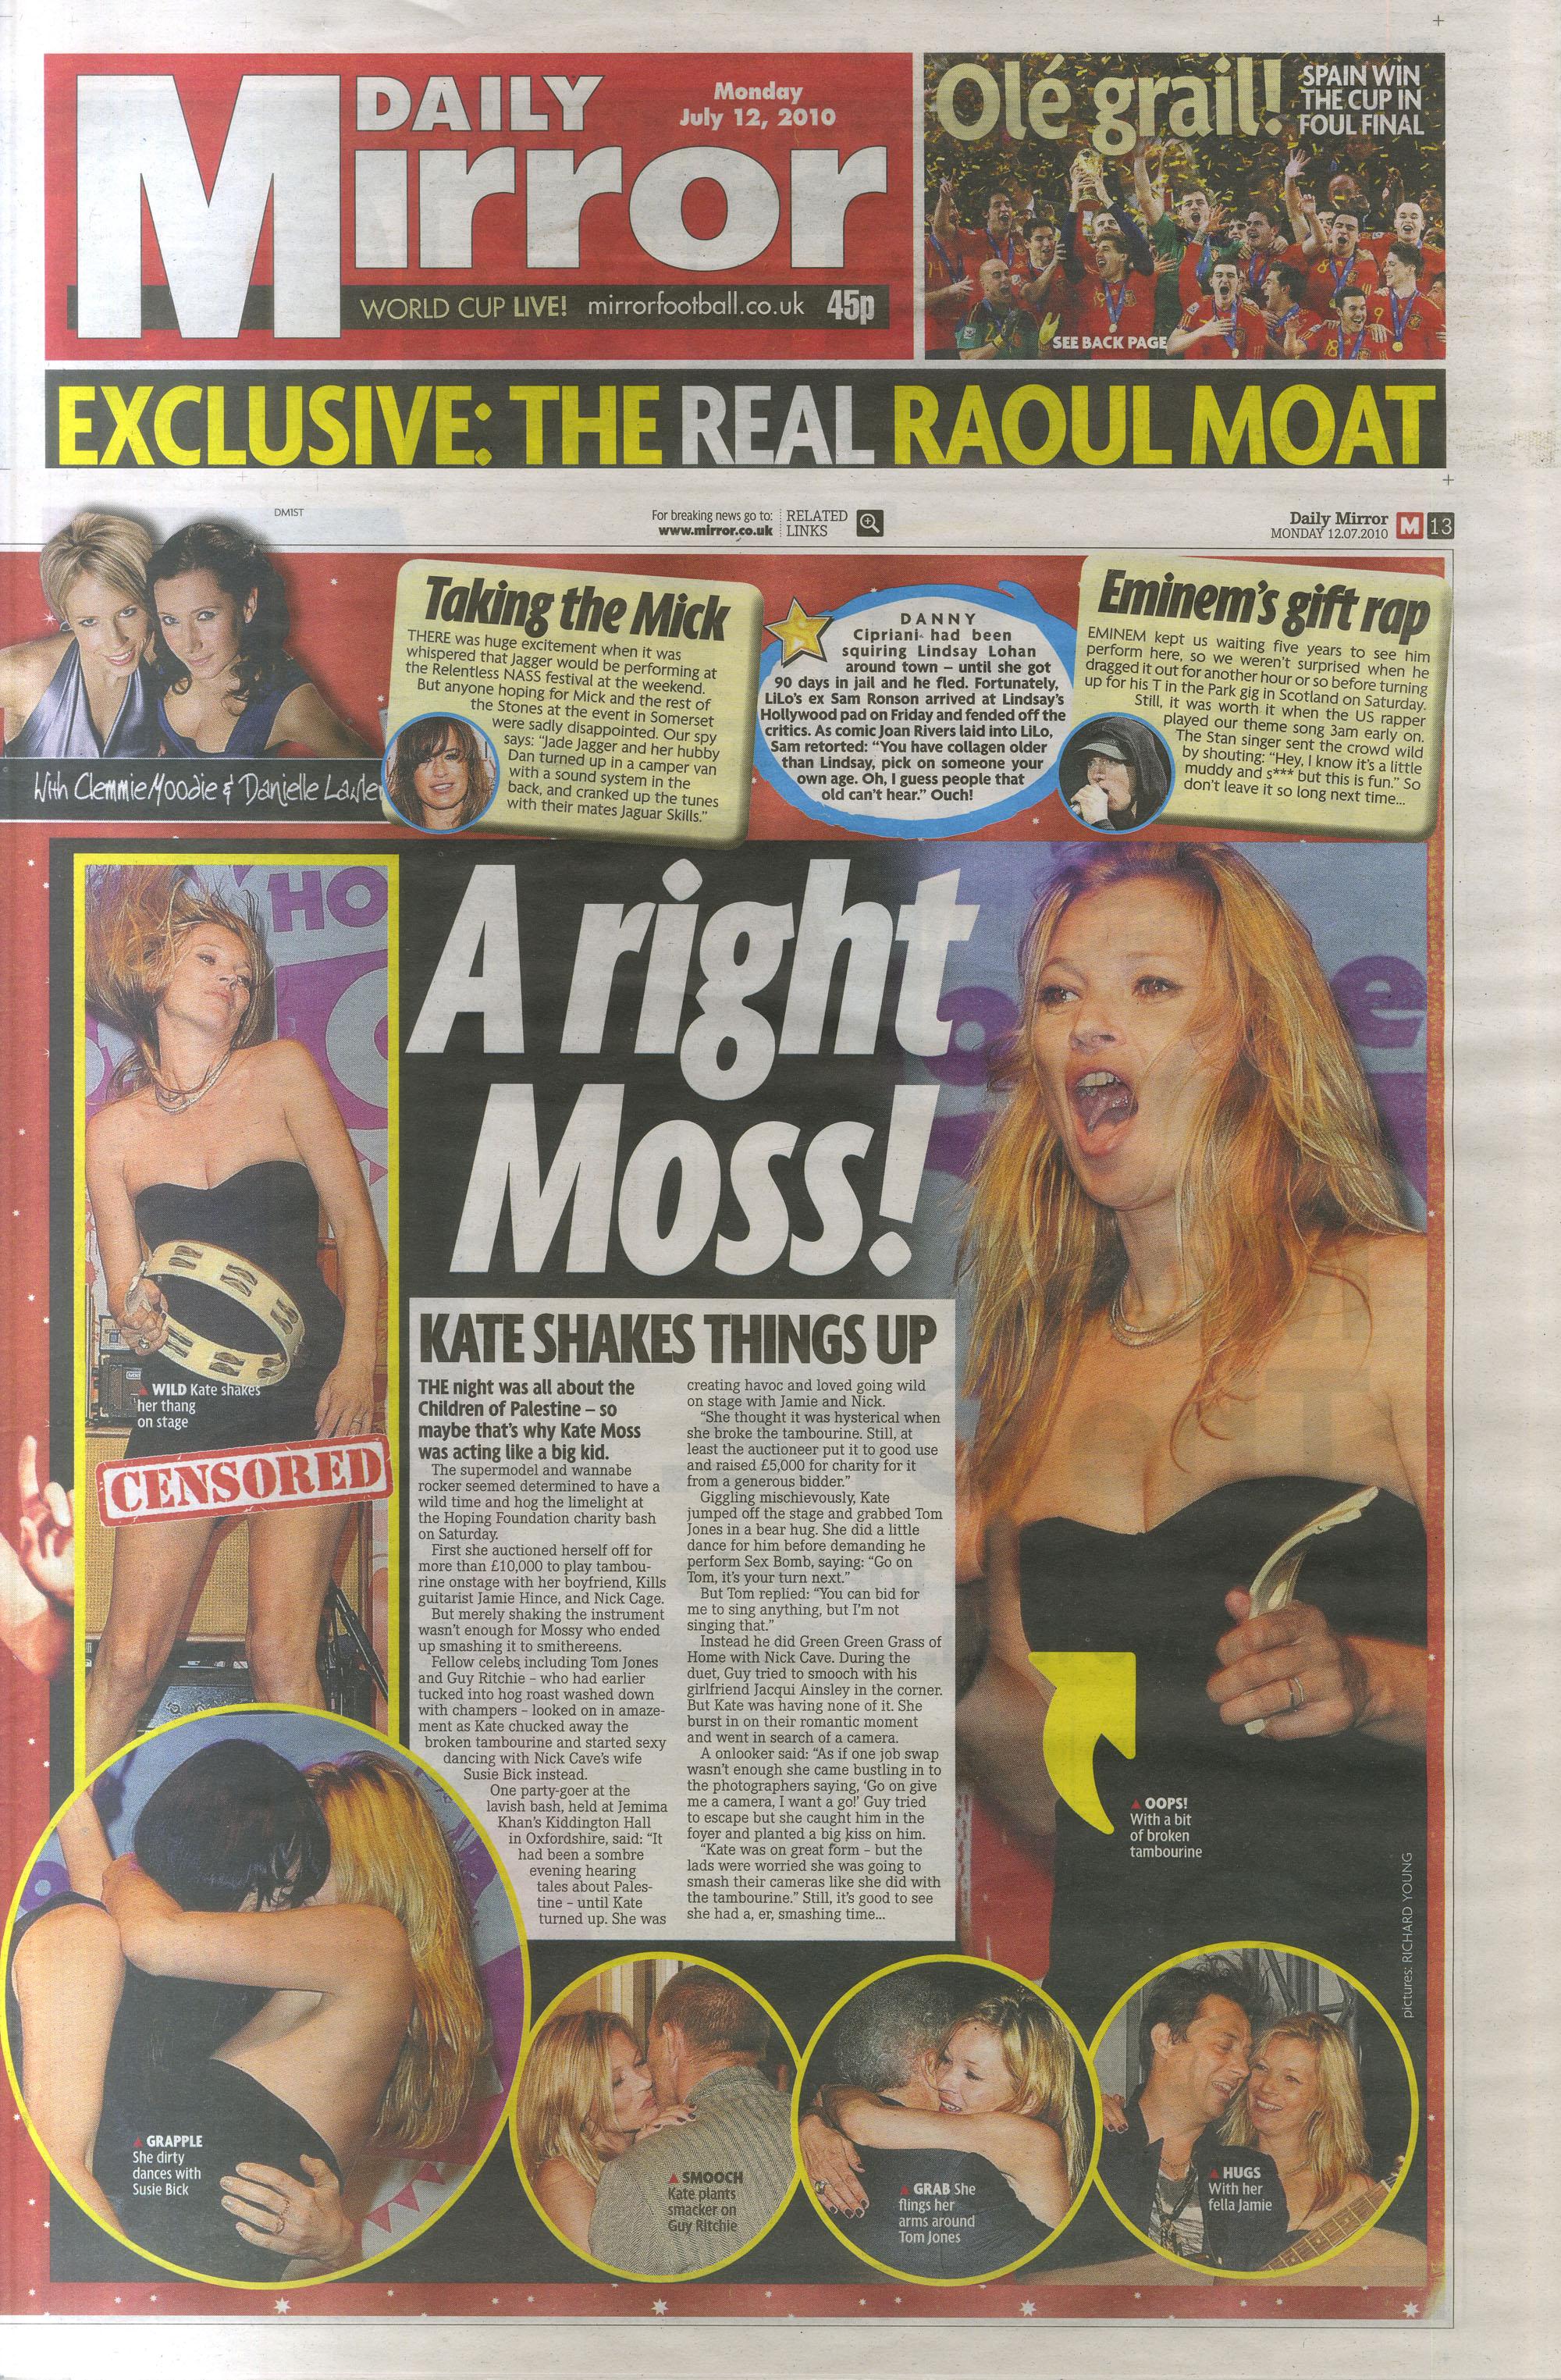 Daily Mirror editorial 12 July 2010 .jpg